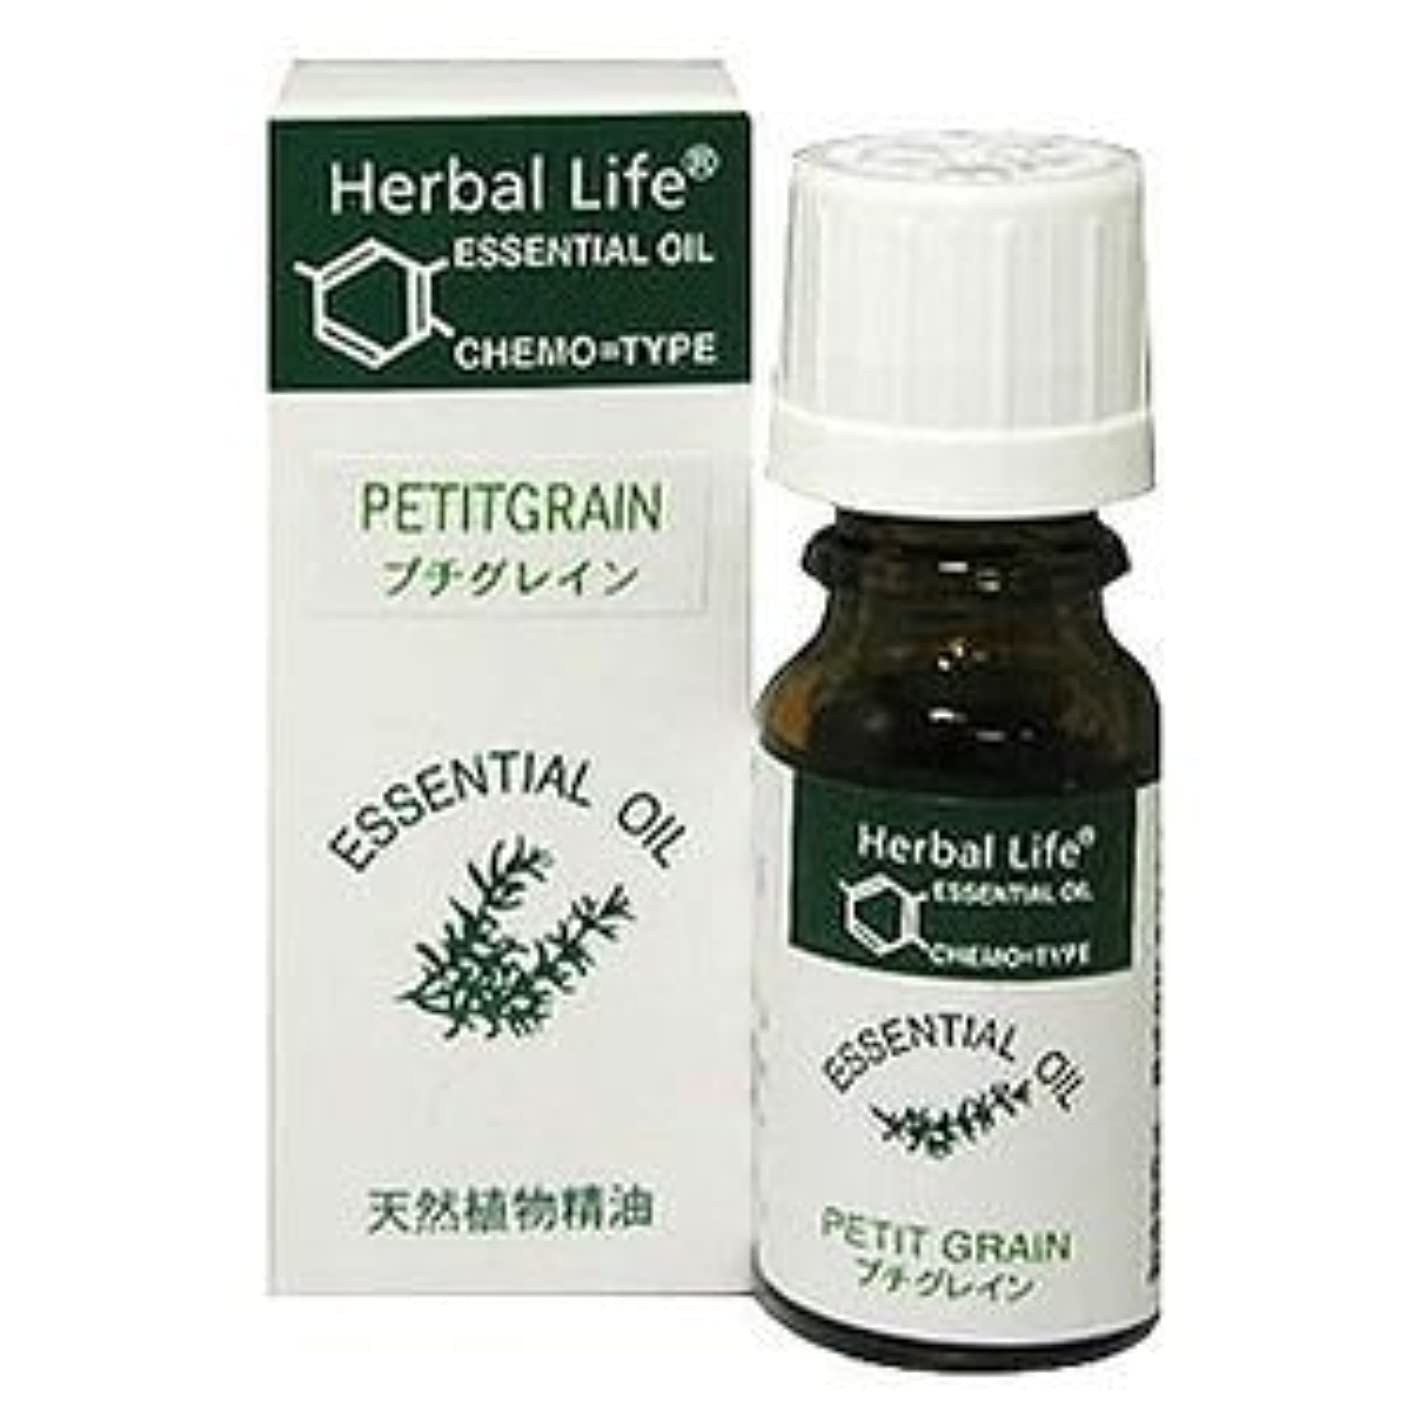 Herbal Life プチグレン 10ml